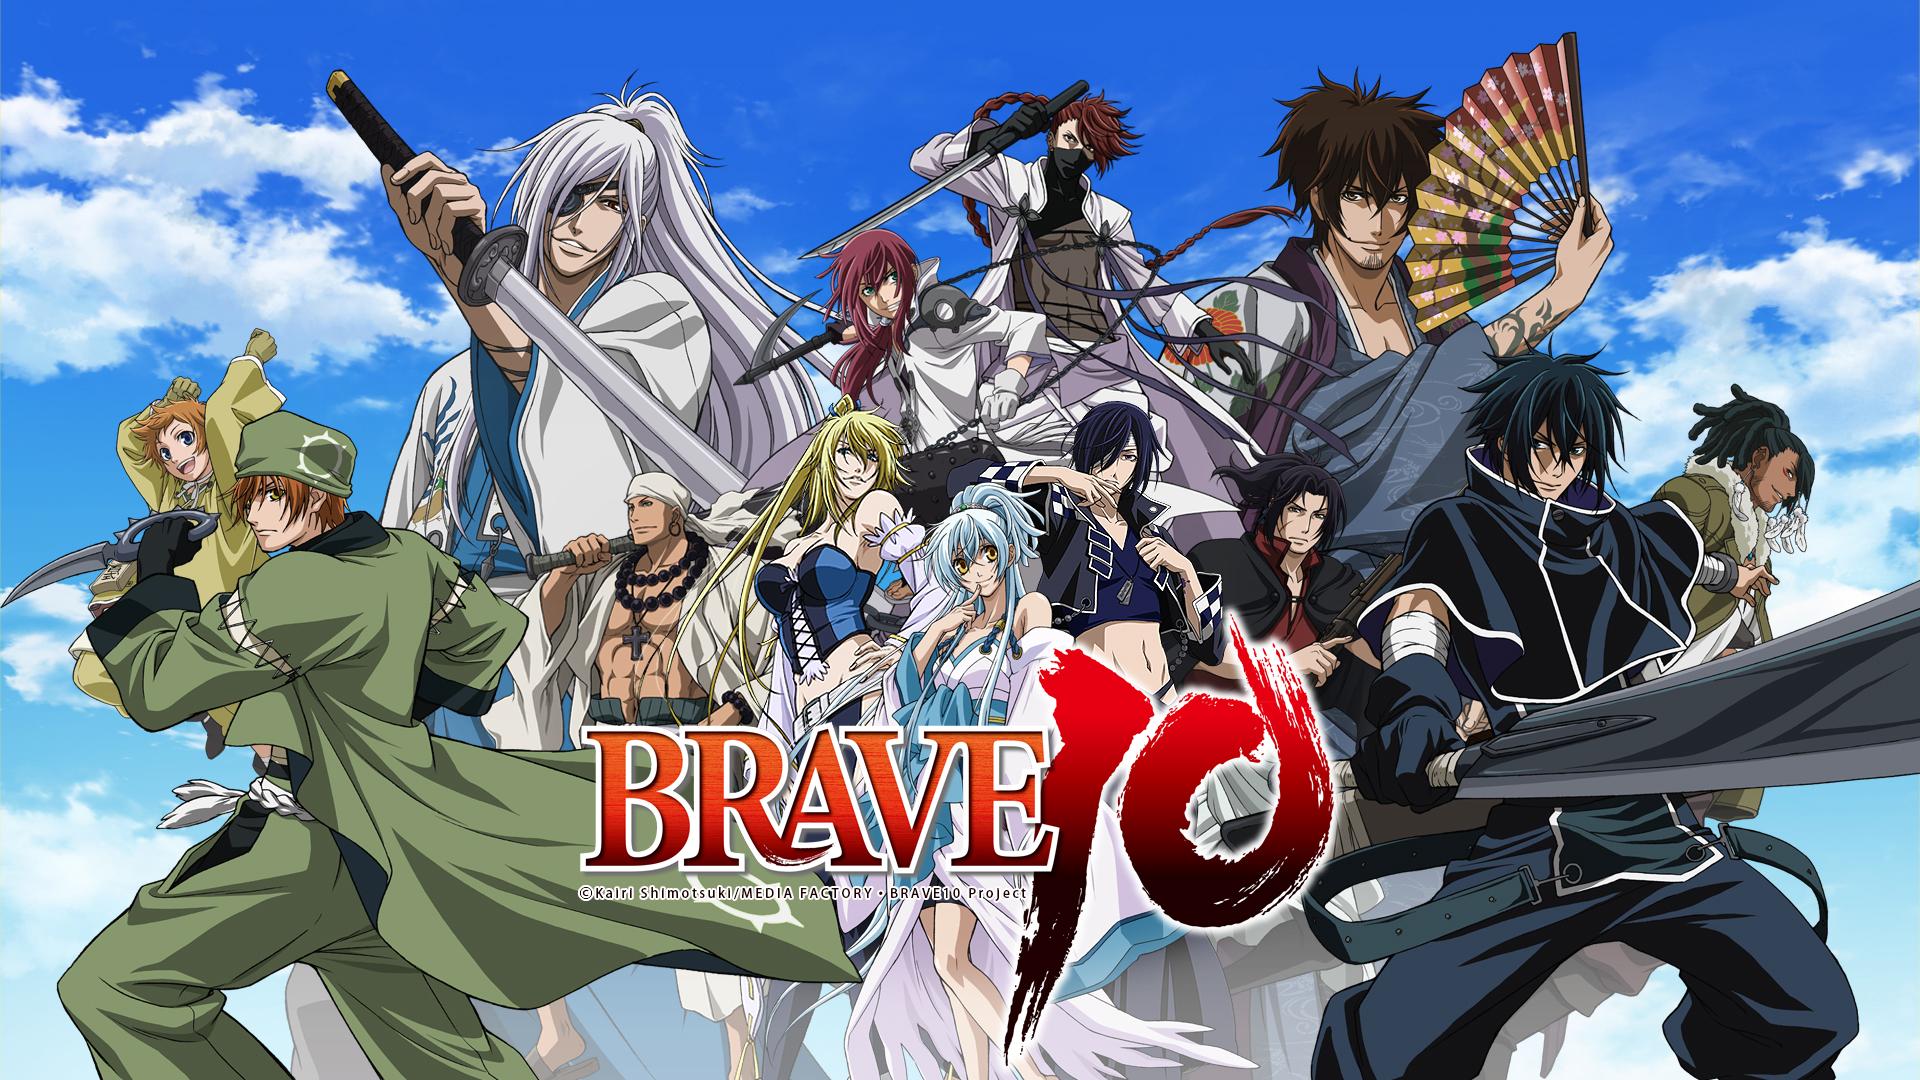 Brave 10 (Subtitles)